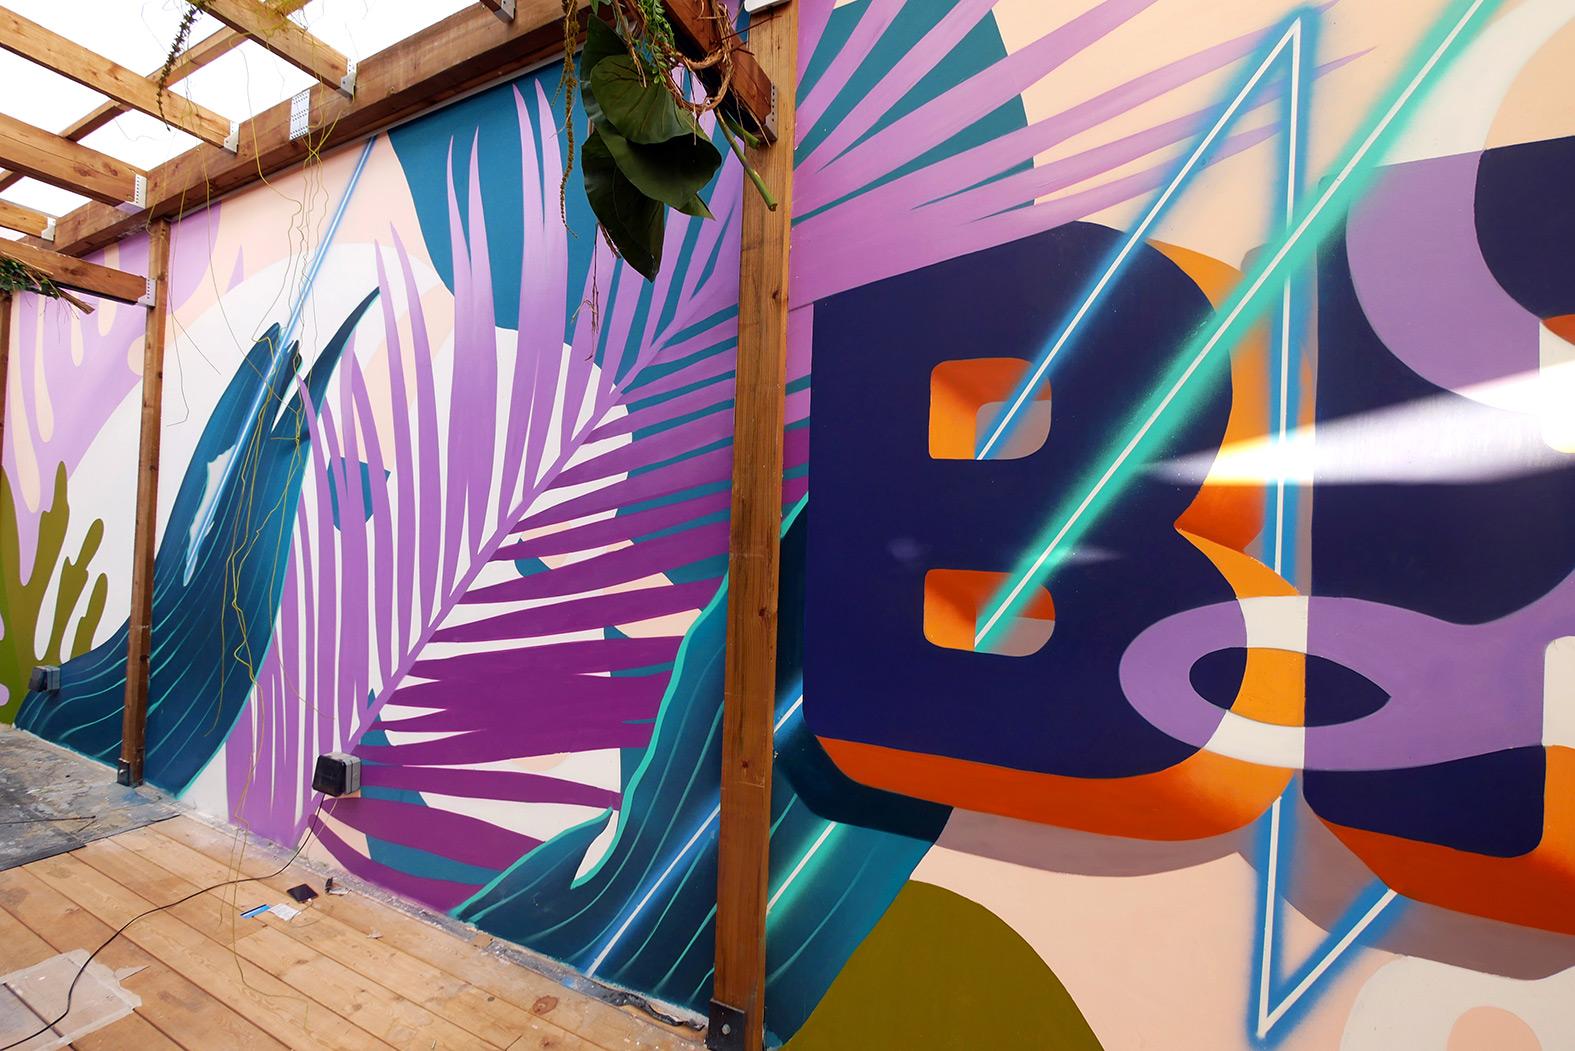 Nerone-lost-in-brixton-mural-painting-street-art-17